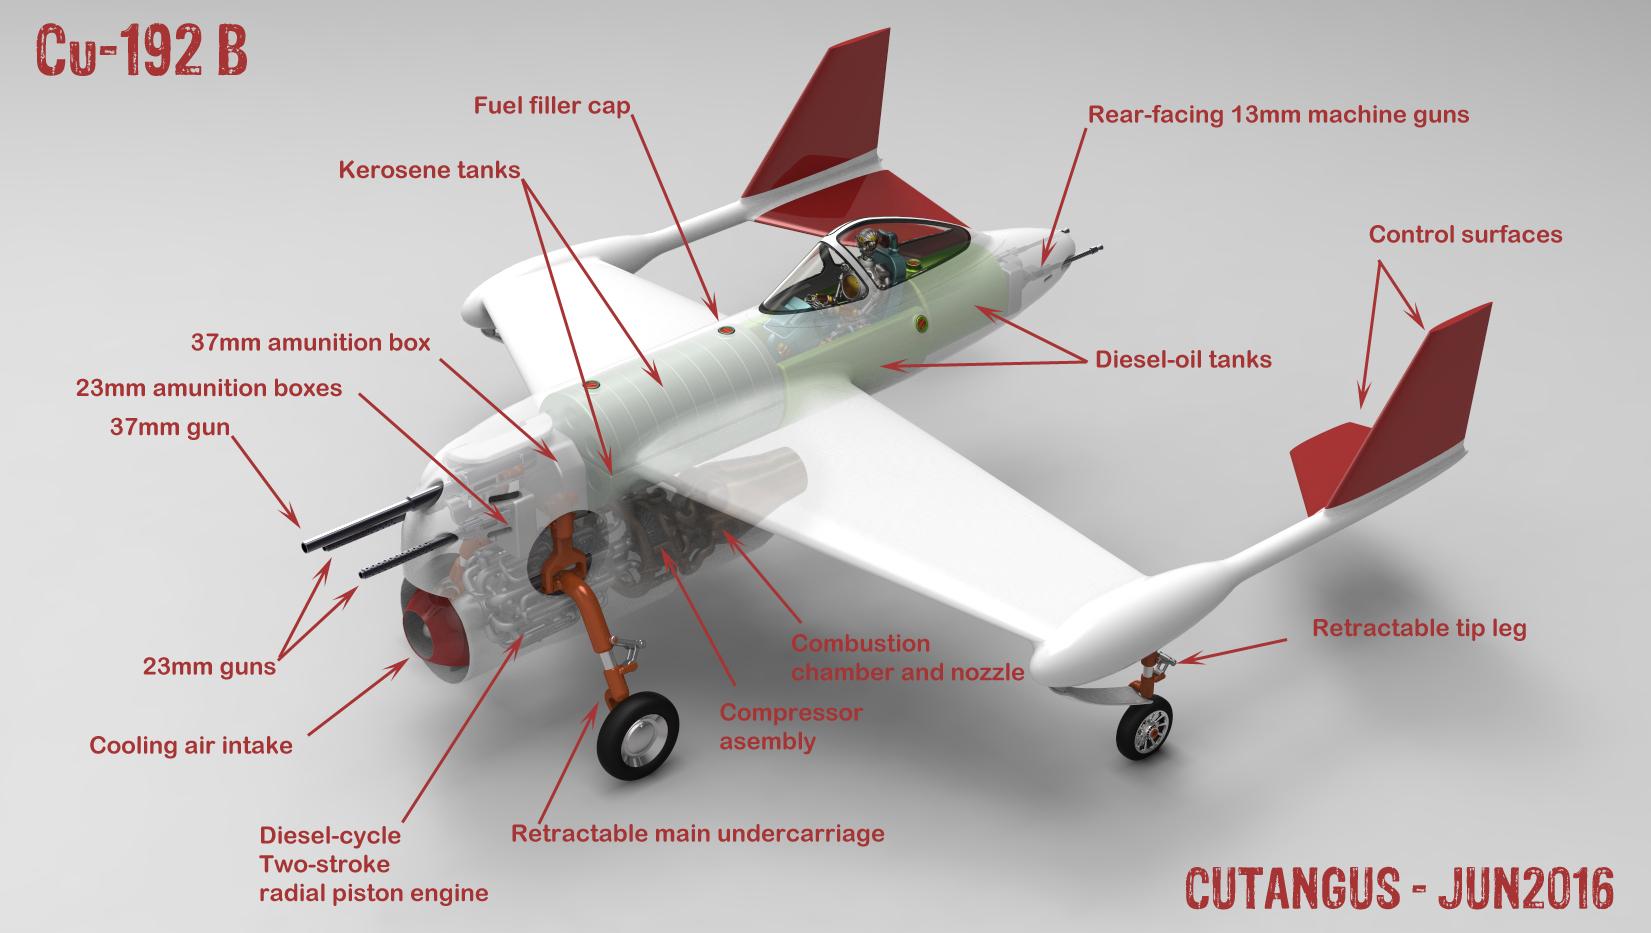 Aircraft Model192 B basic components by CUTANGUS